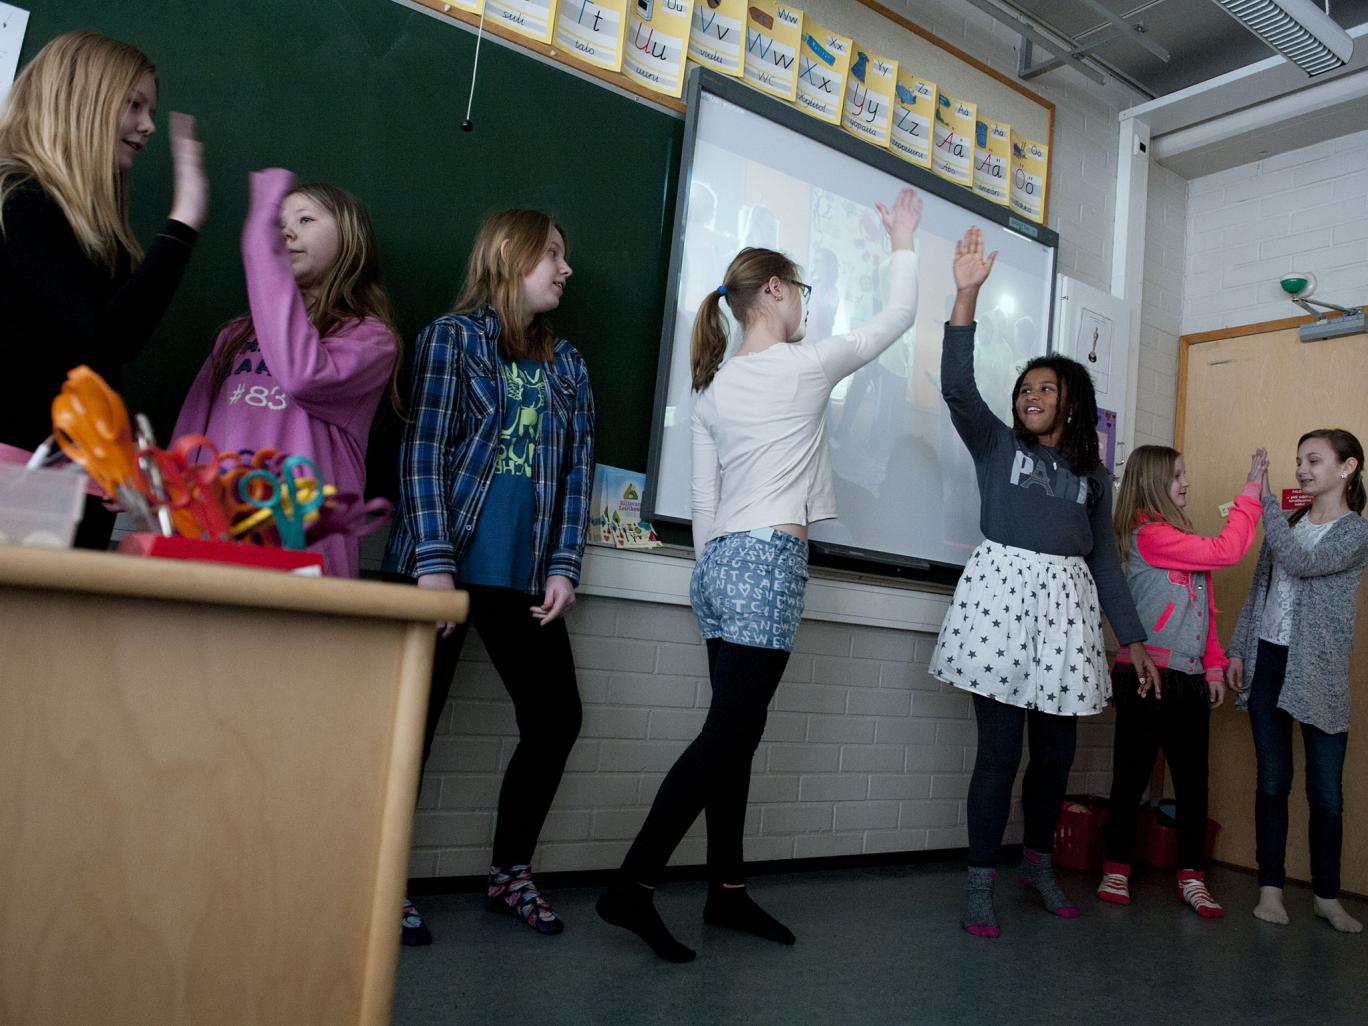 Finland_school1.jpg